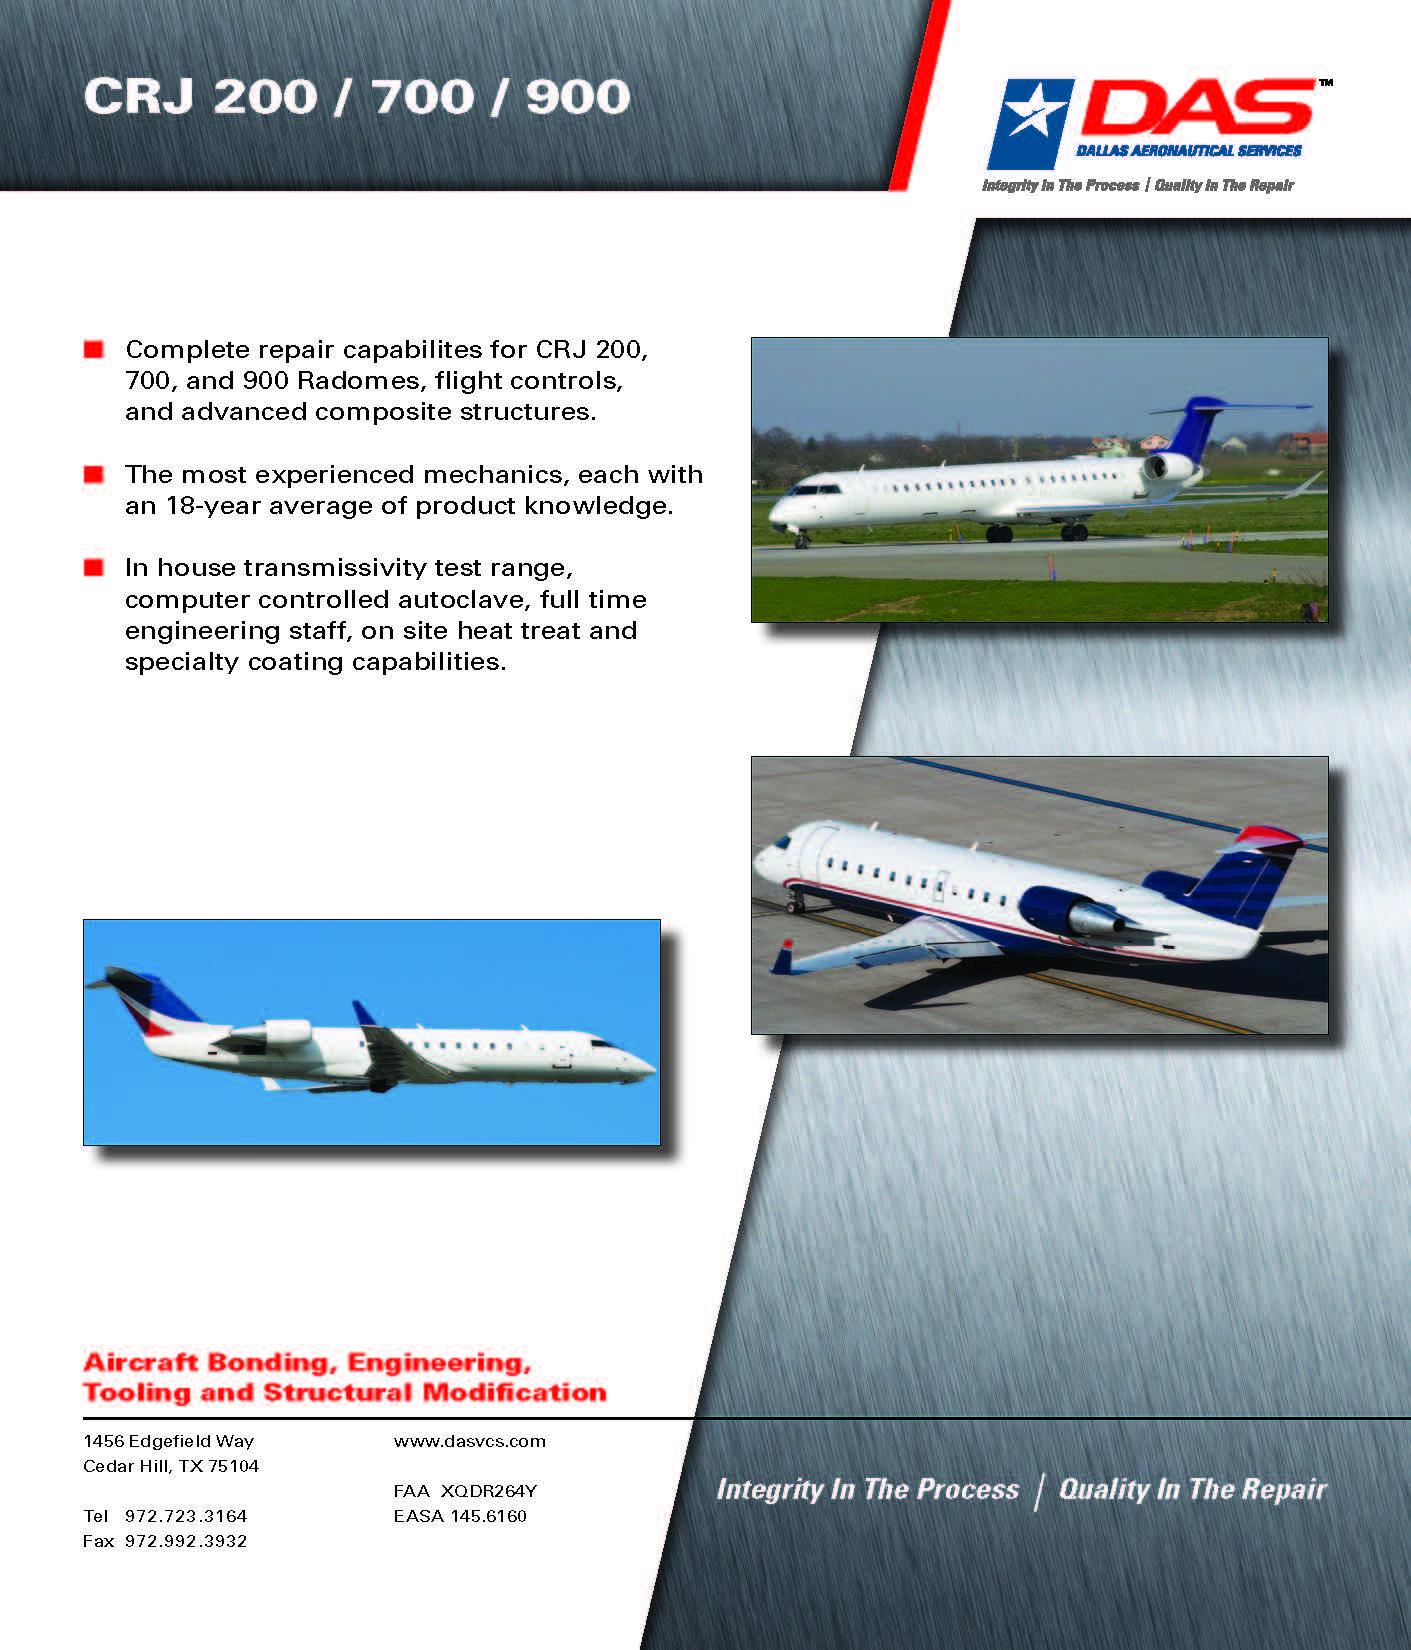 DAS-CRJ sheet F4-LR corp.jpg